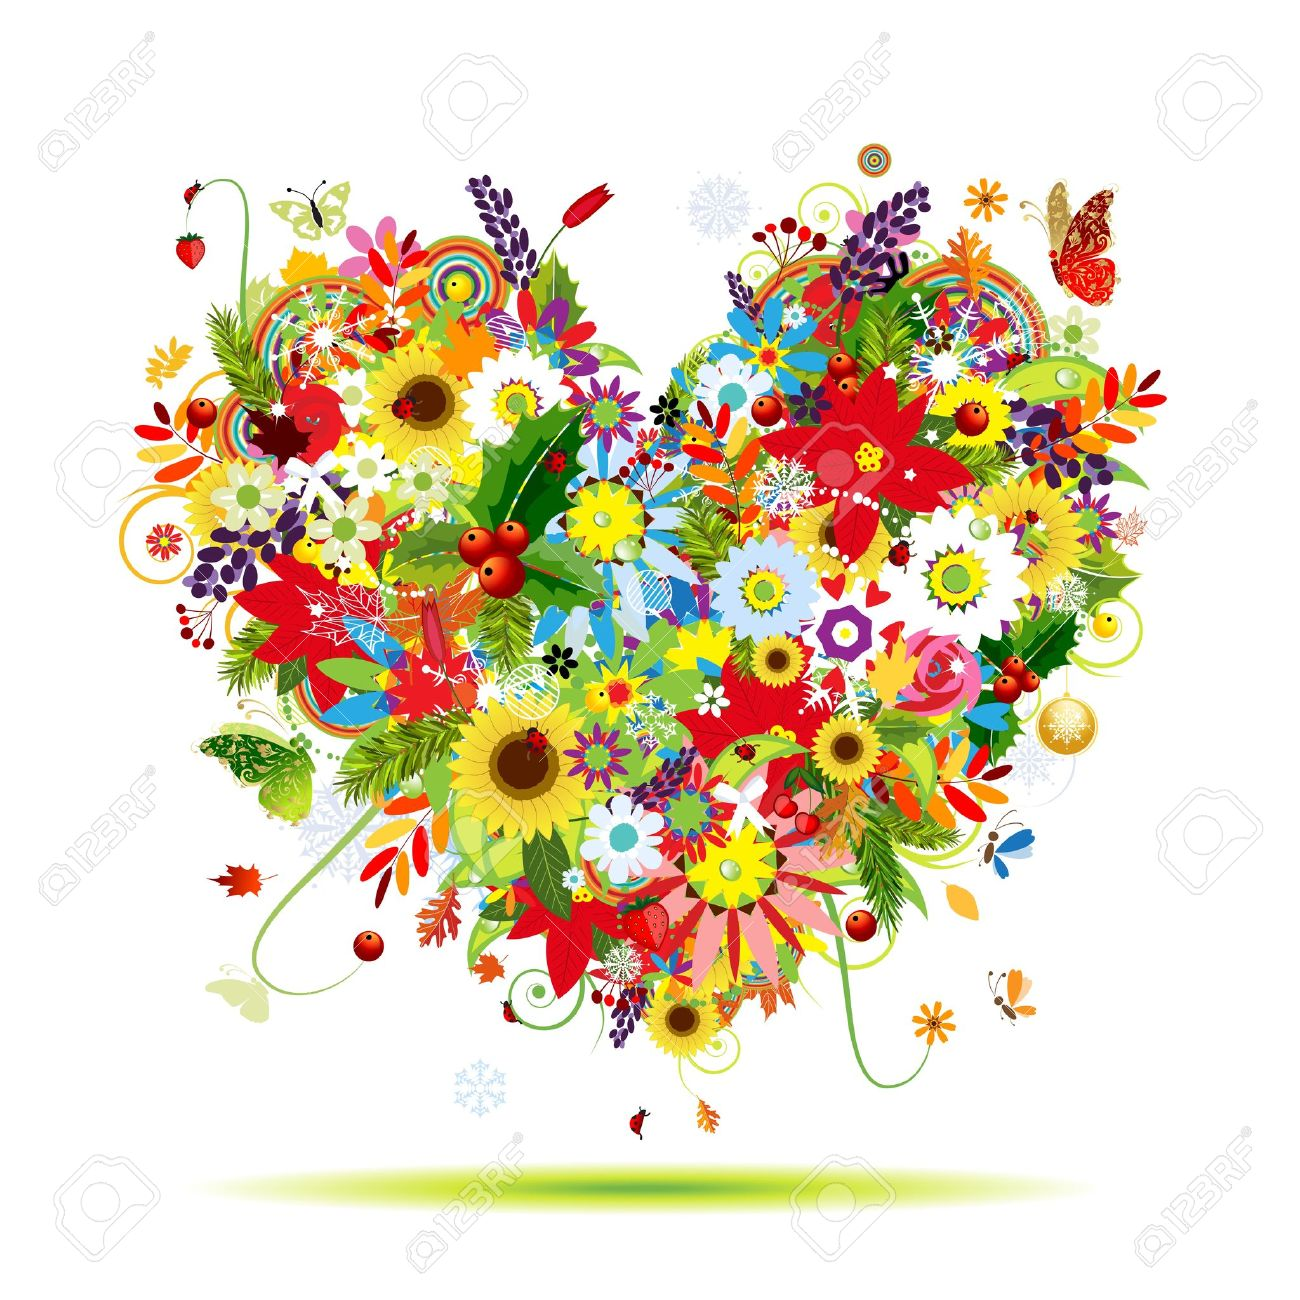 Four seasons  Art heart shape for your design Stock Vector - 12840585